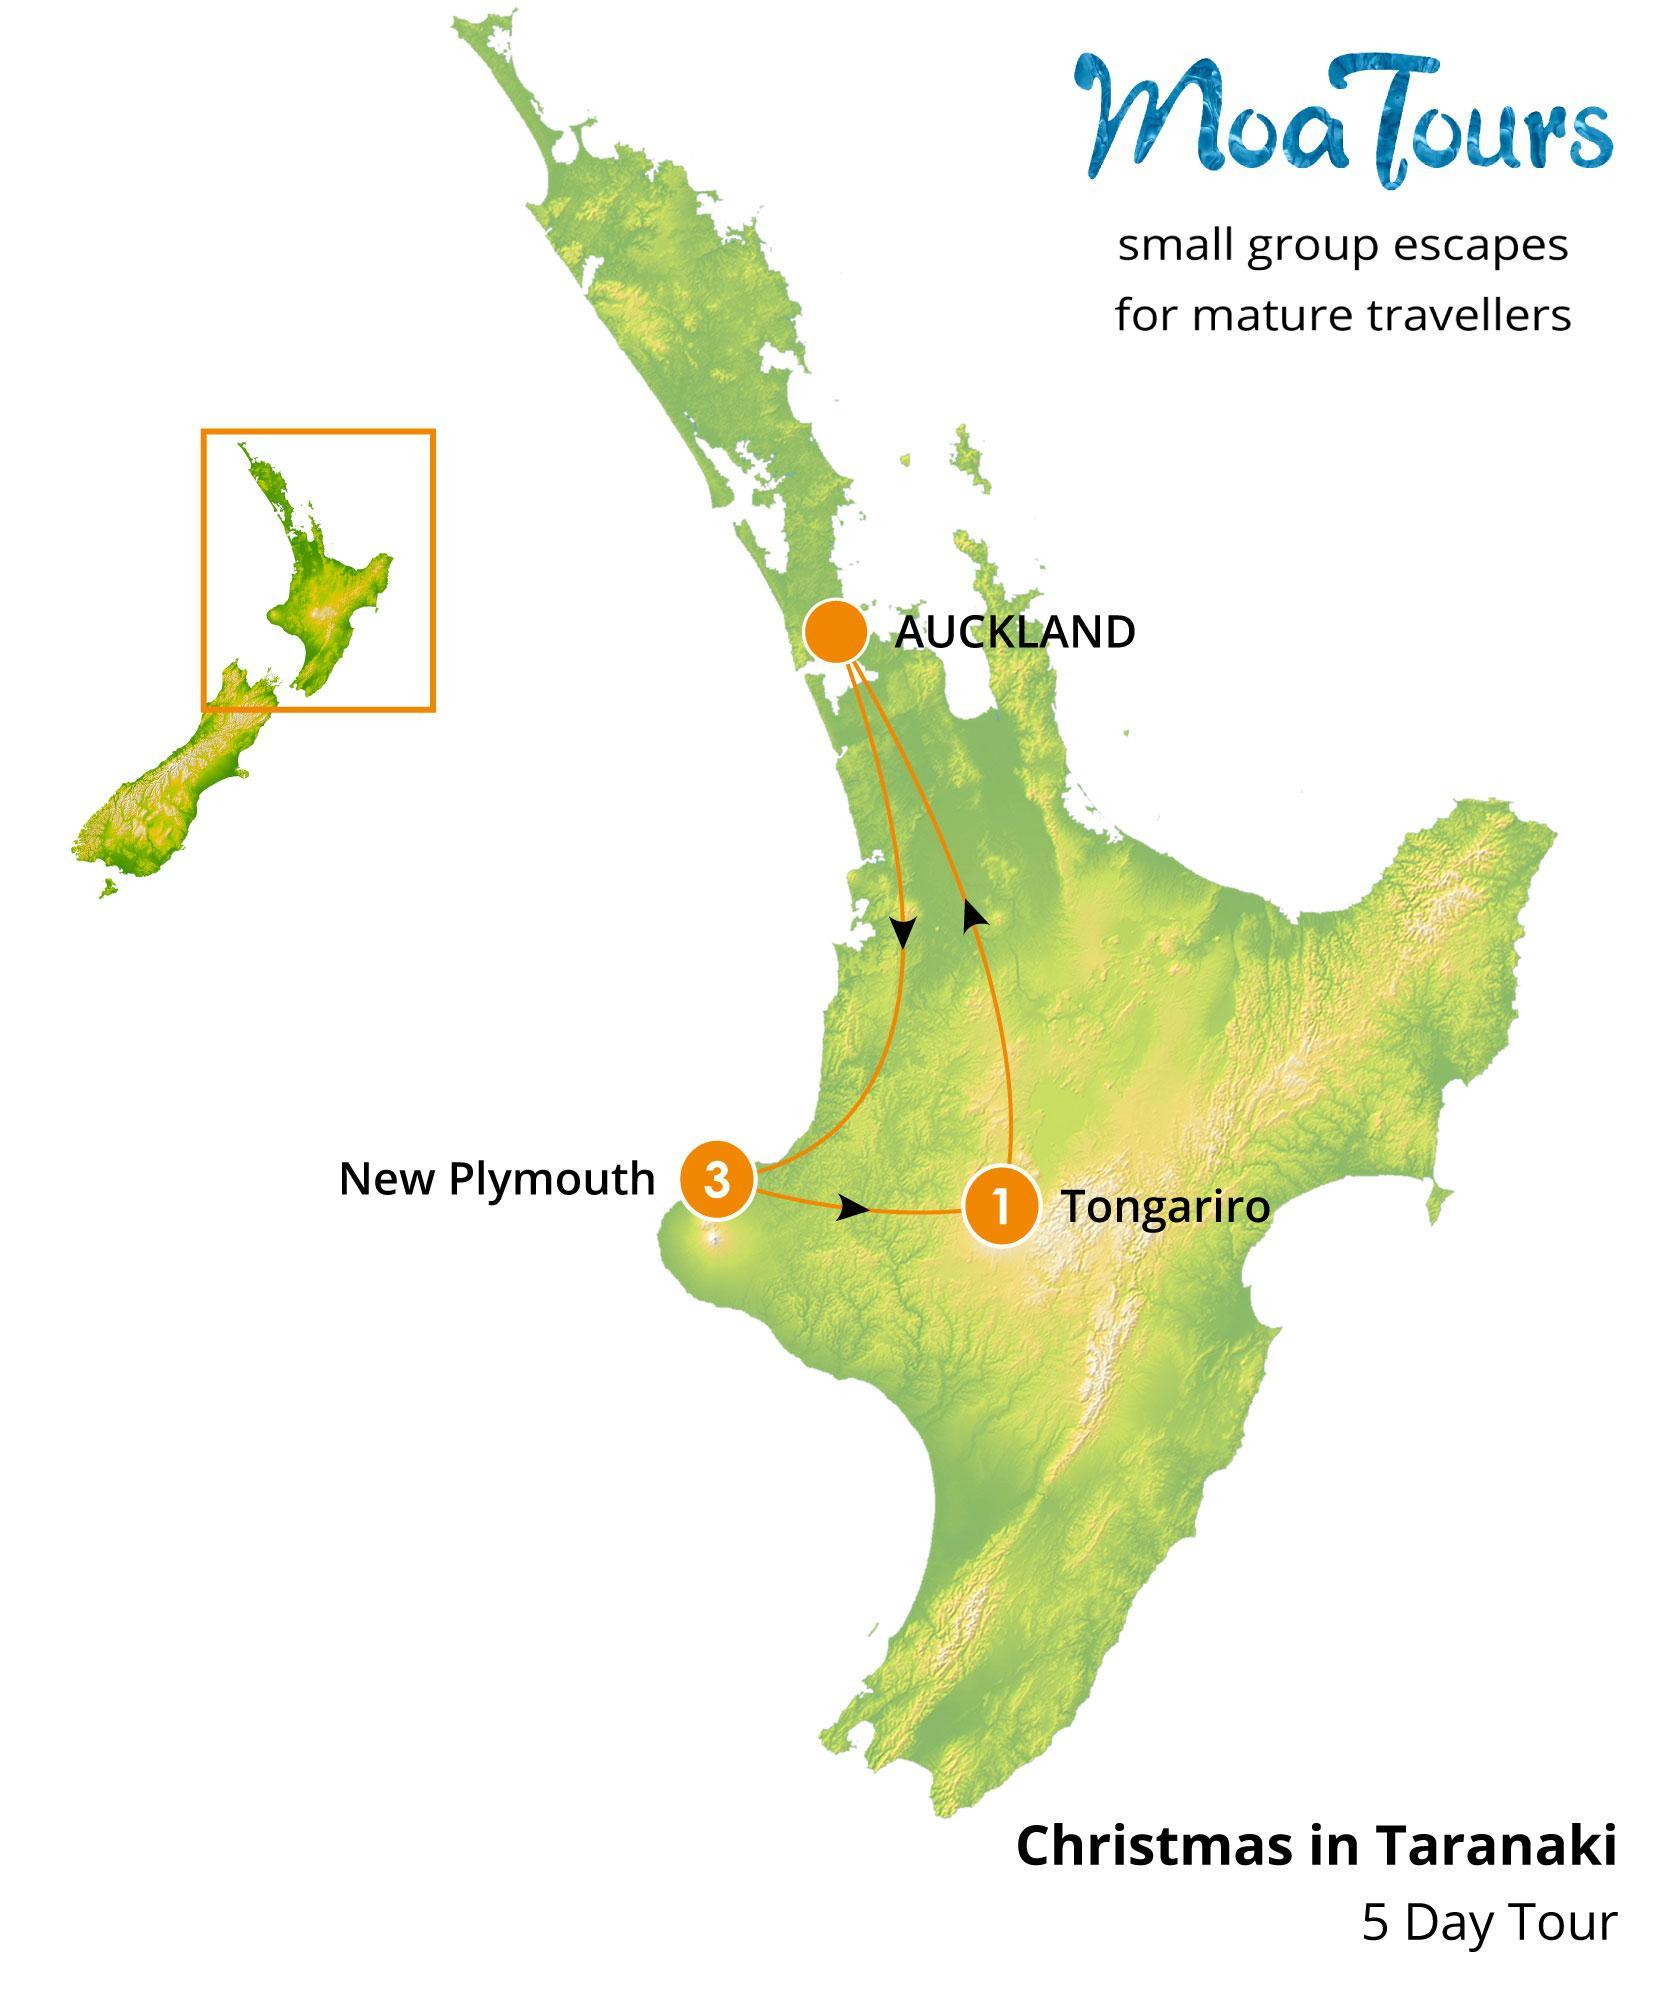 Christmas in Taranaki 5 day tour   MoaTours New Zealand